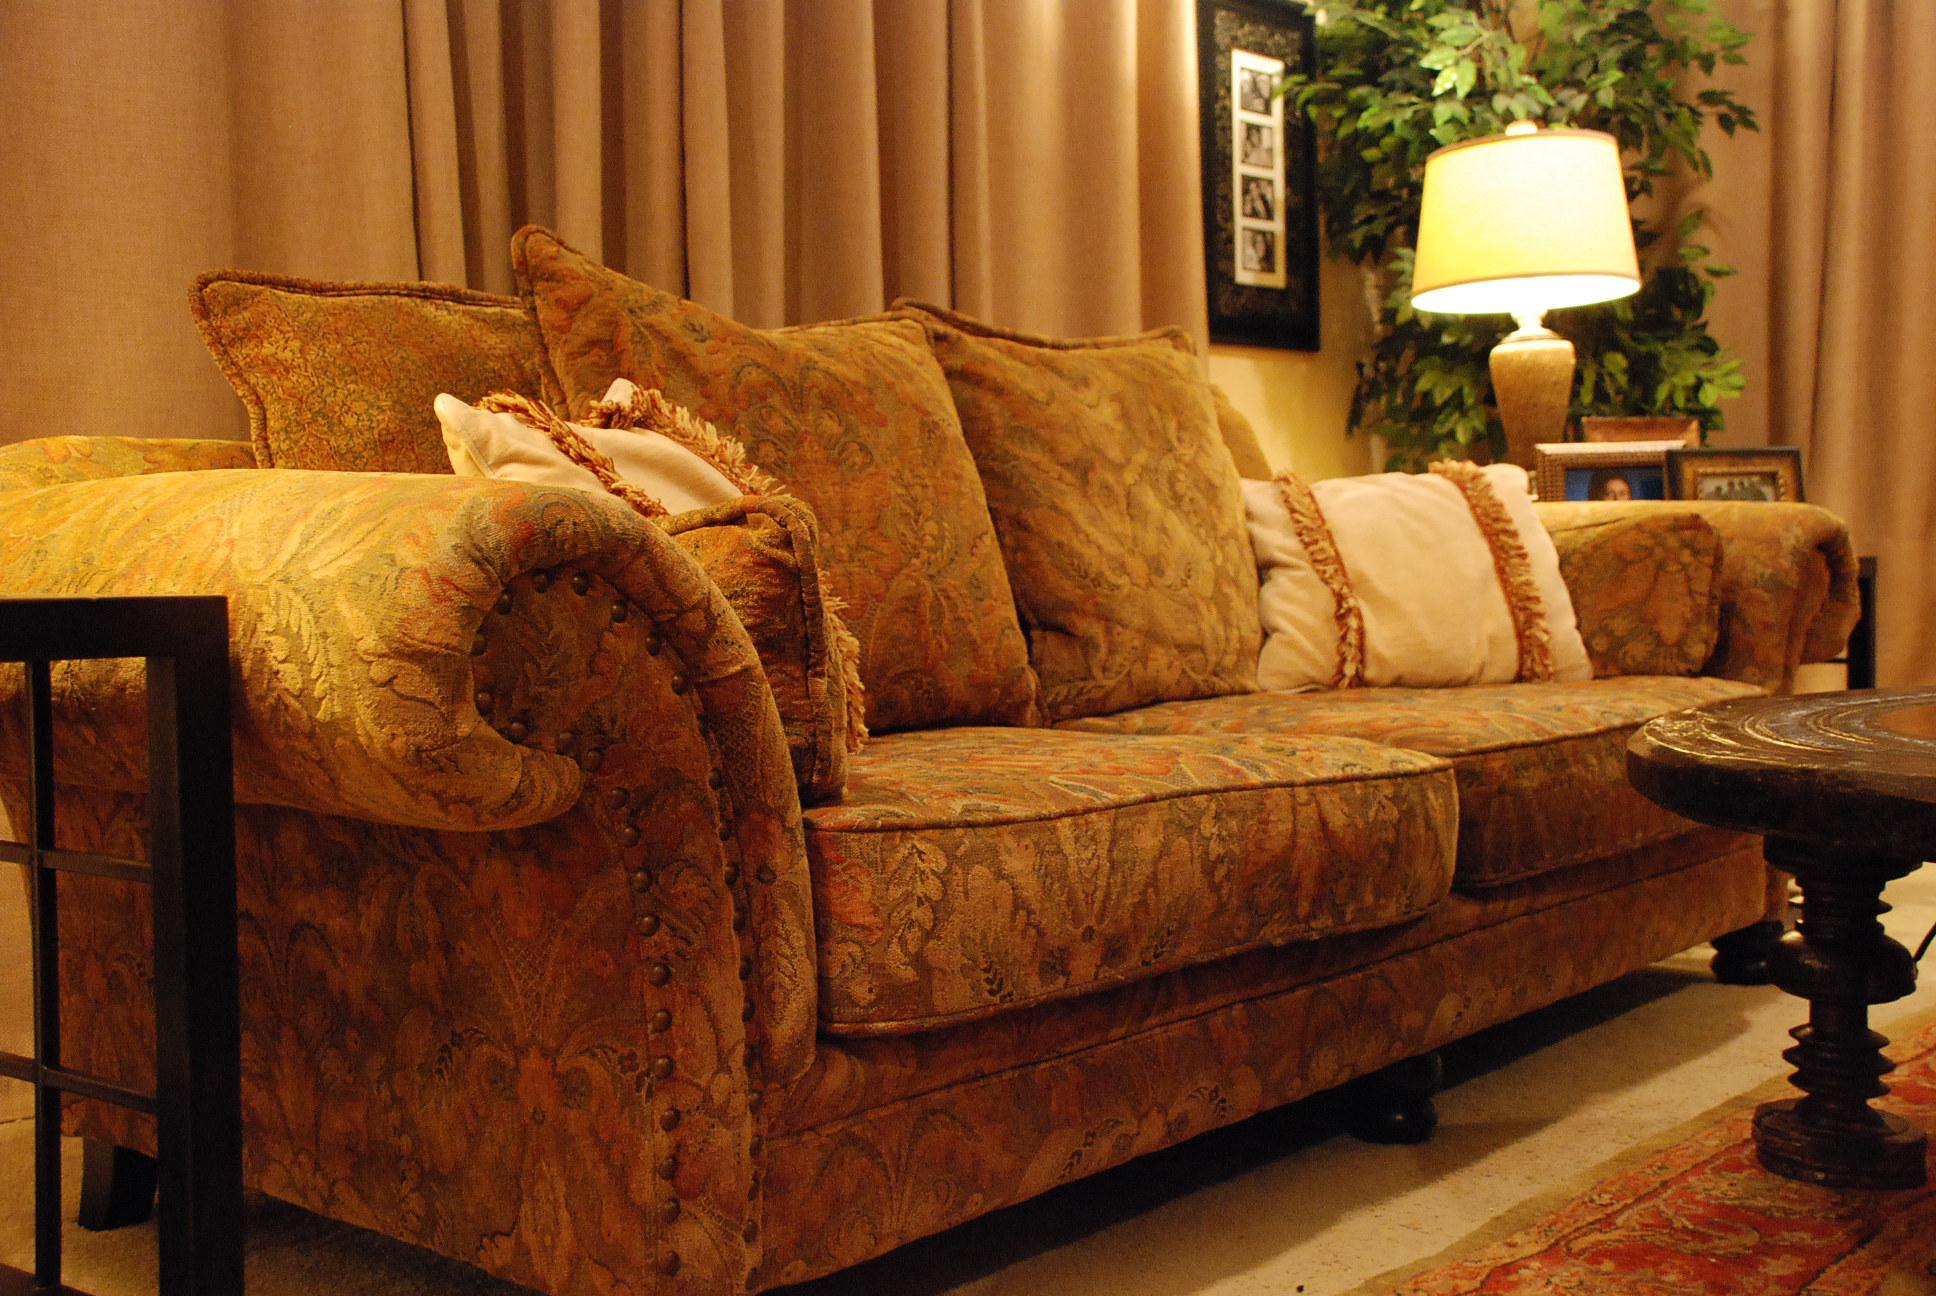 Bernhardt New Vintages Collection Floral Upholstered Sofa   Image 4 Of 5